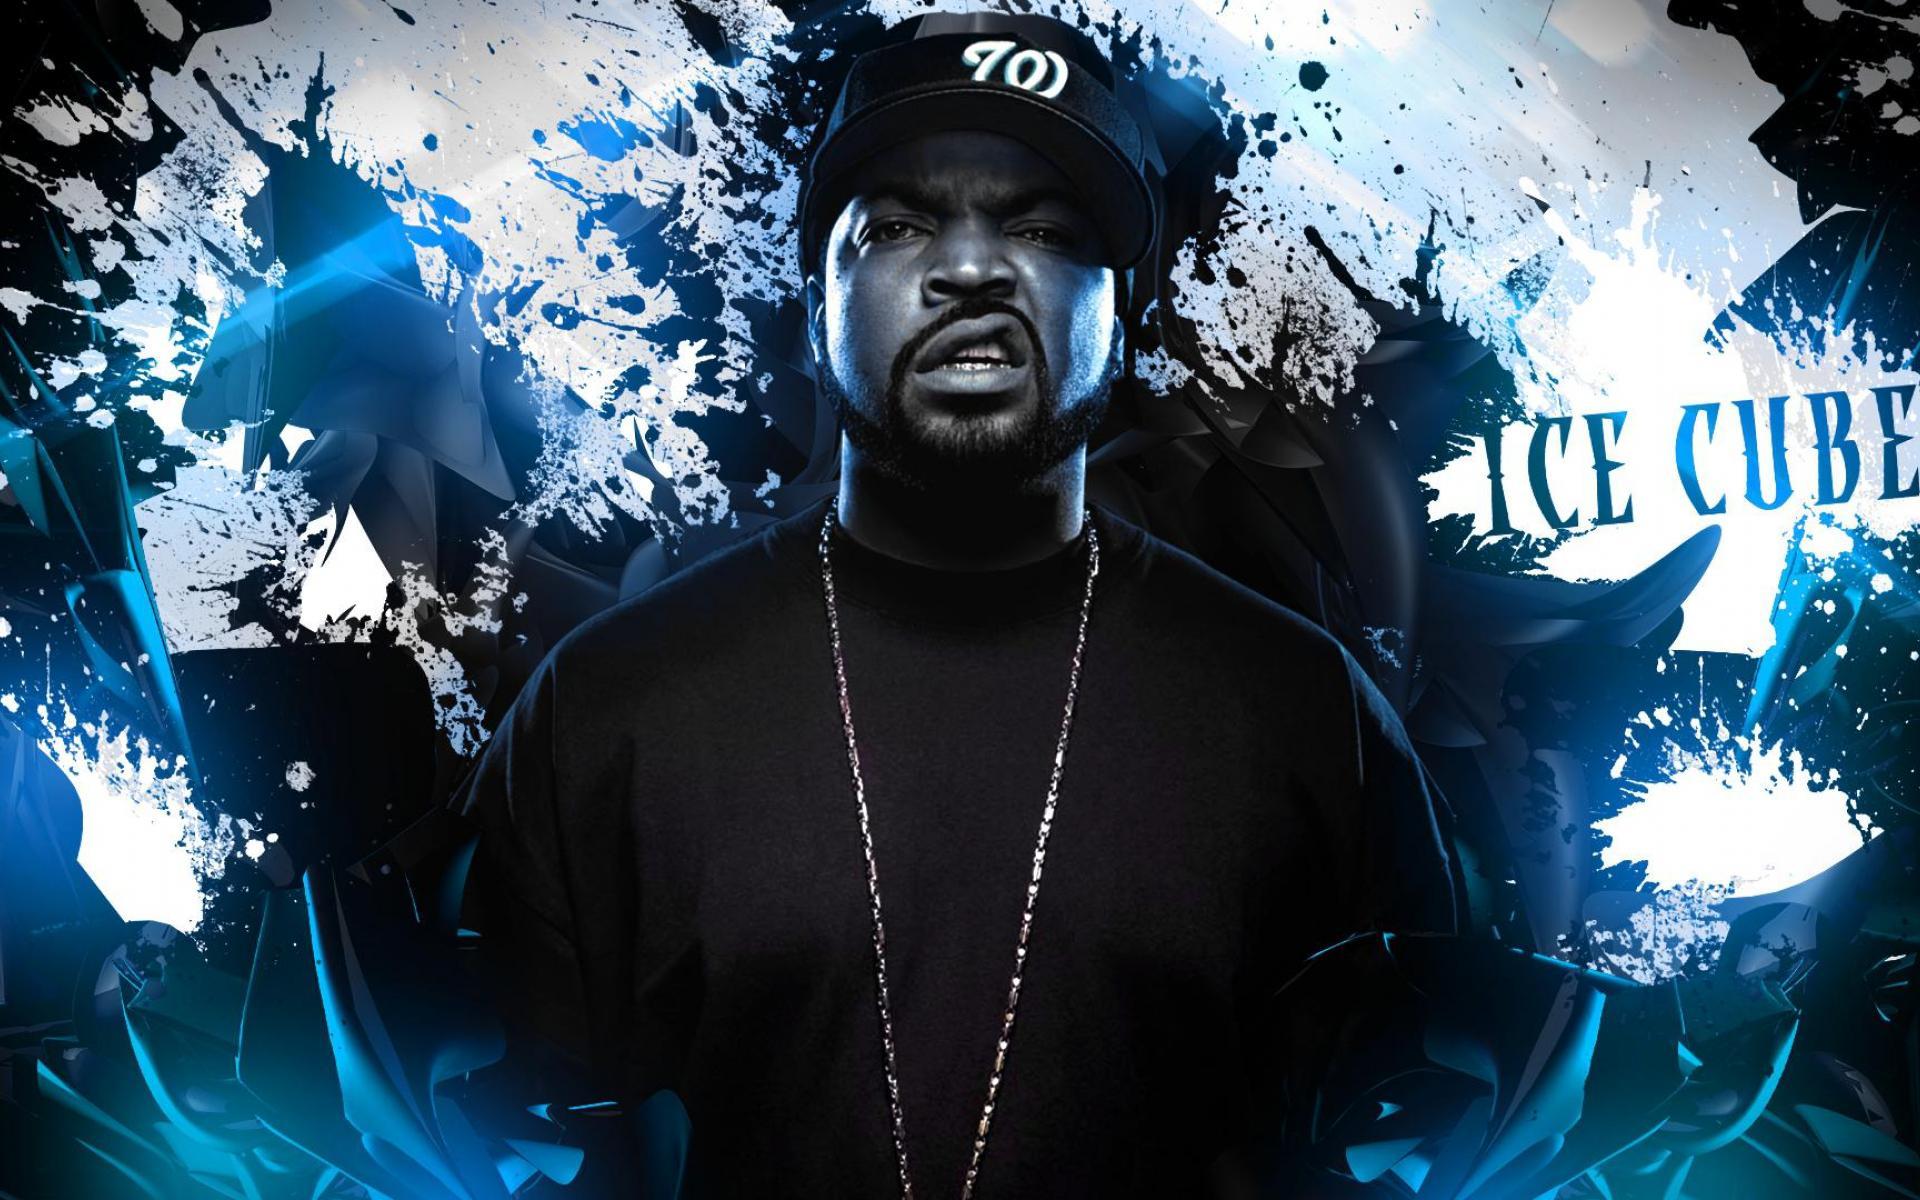 ICE CUBE gangsta rapper rap hip hop r wallpaper 1920x1200 180880 1920x1200